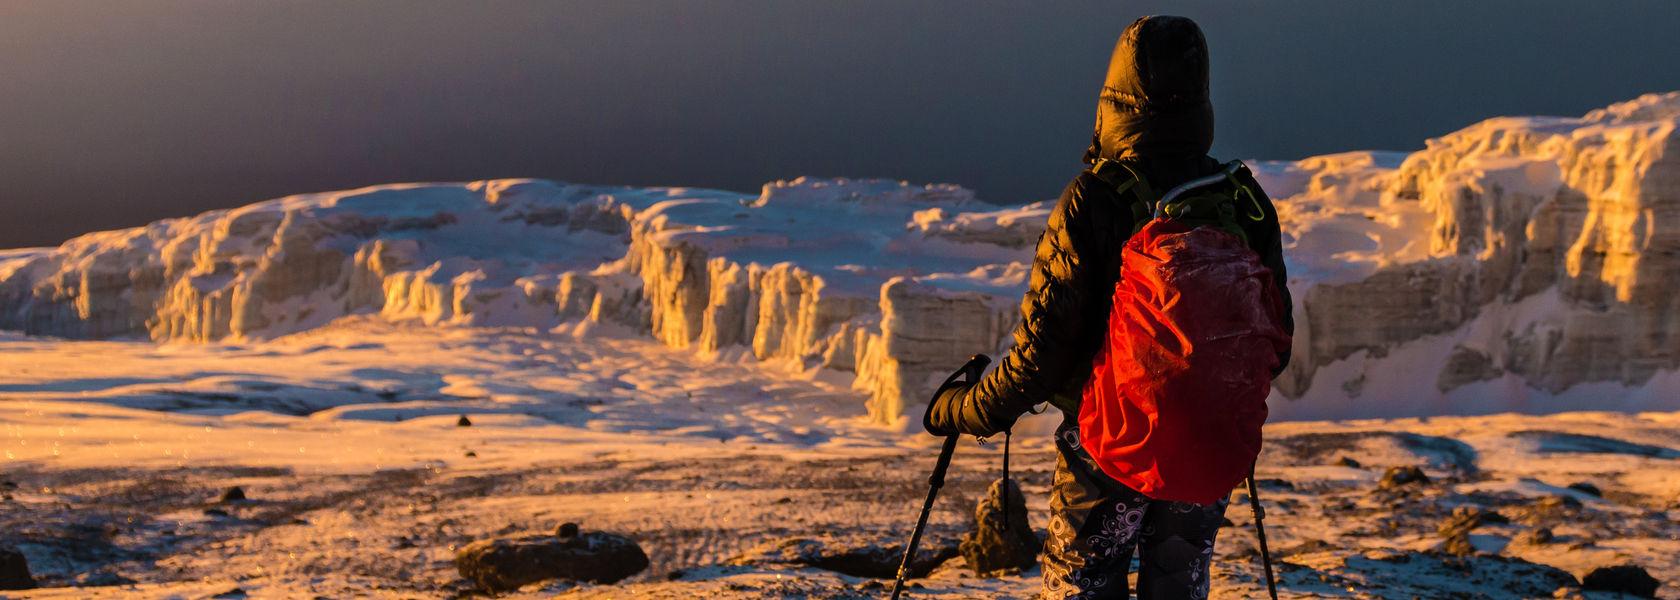 Kilimanjaro Groepsreis - groepsreizen Kilimanjaro met GEGARANDEERD vertrek